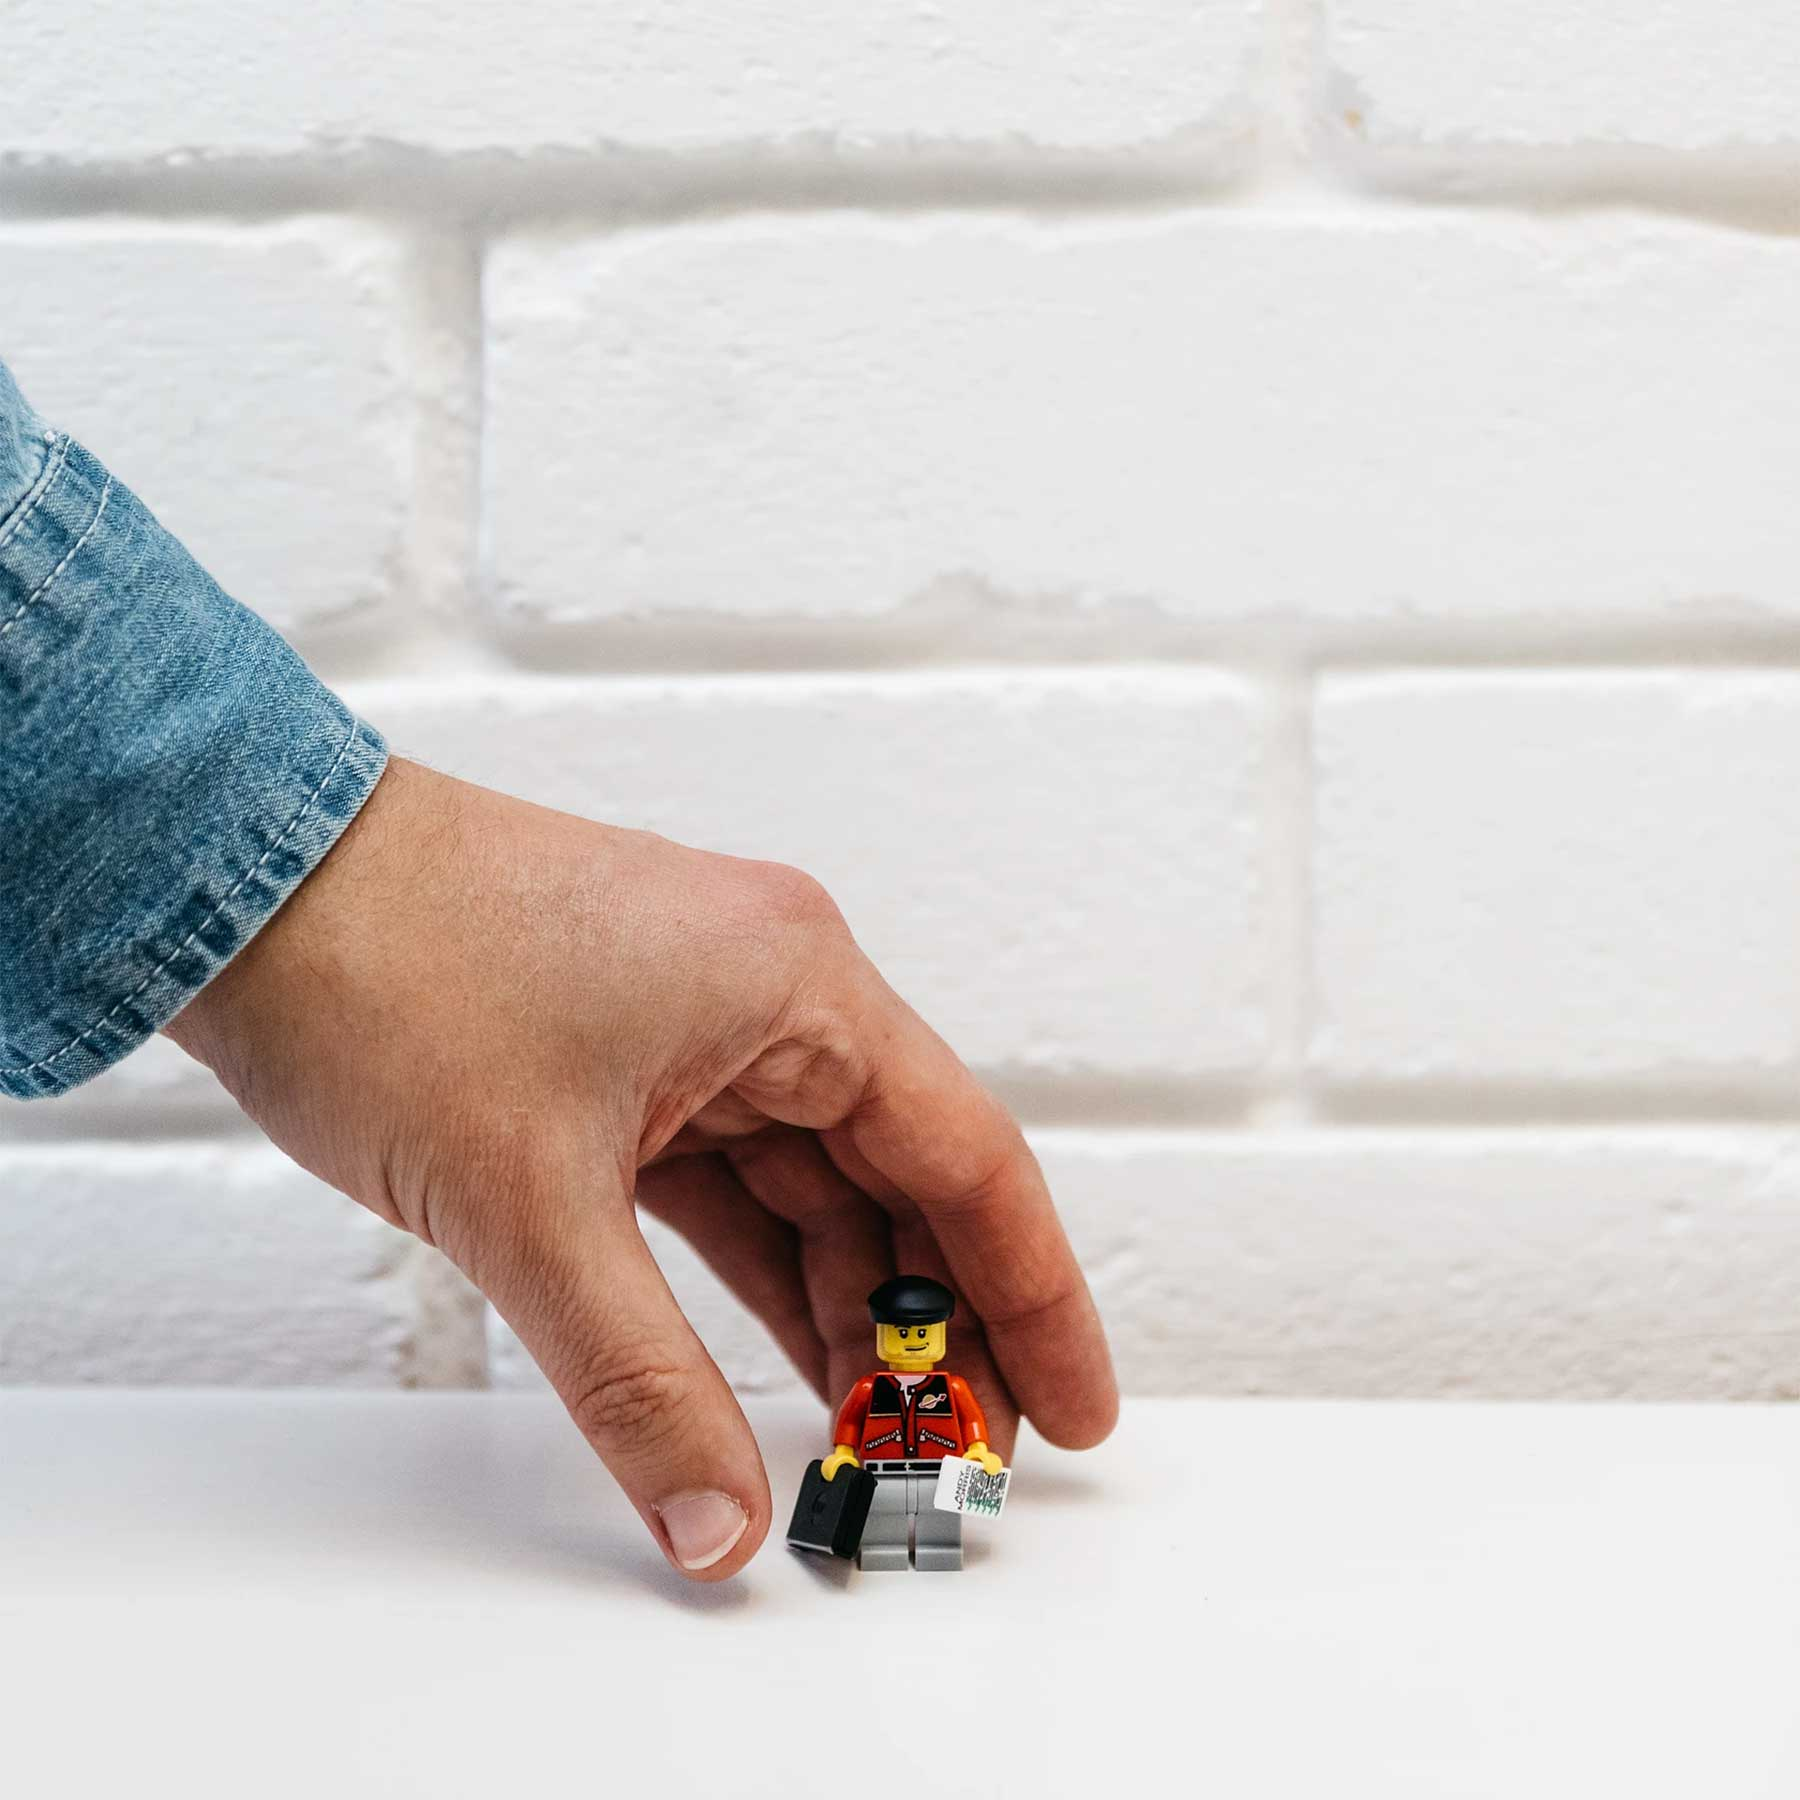 Bewerbung per LEGO-Minifigure Bewerbung-per-LEGOfigur_05